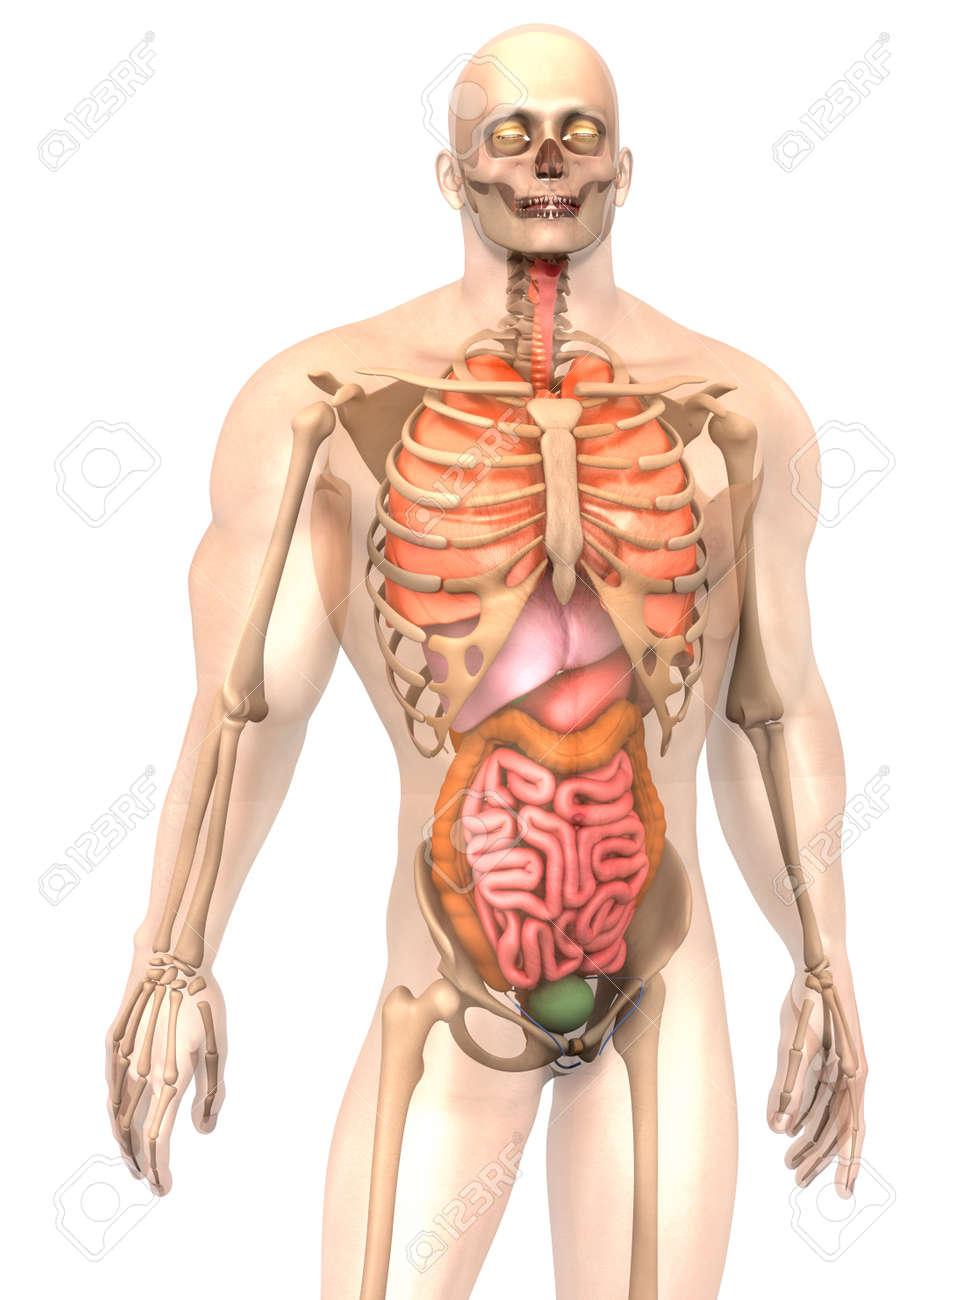 Atractivo Dibujos De Anatomía Médica Kaplan Viñeta - Enmarcado Para ...